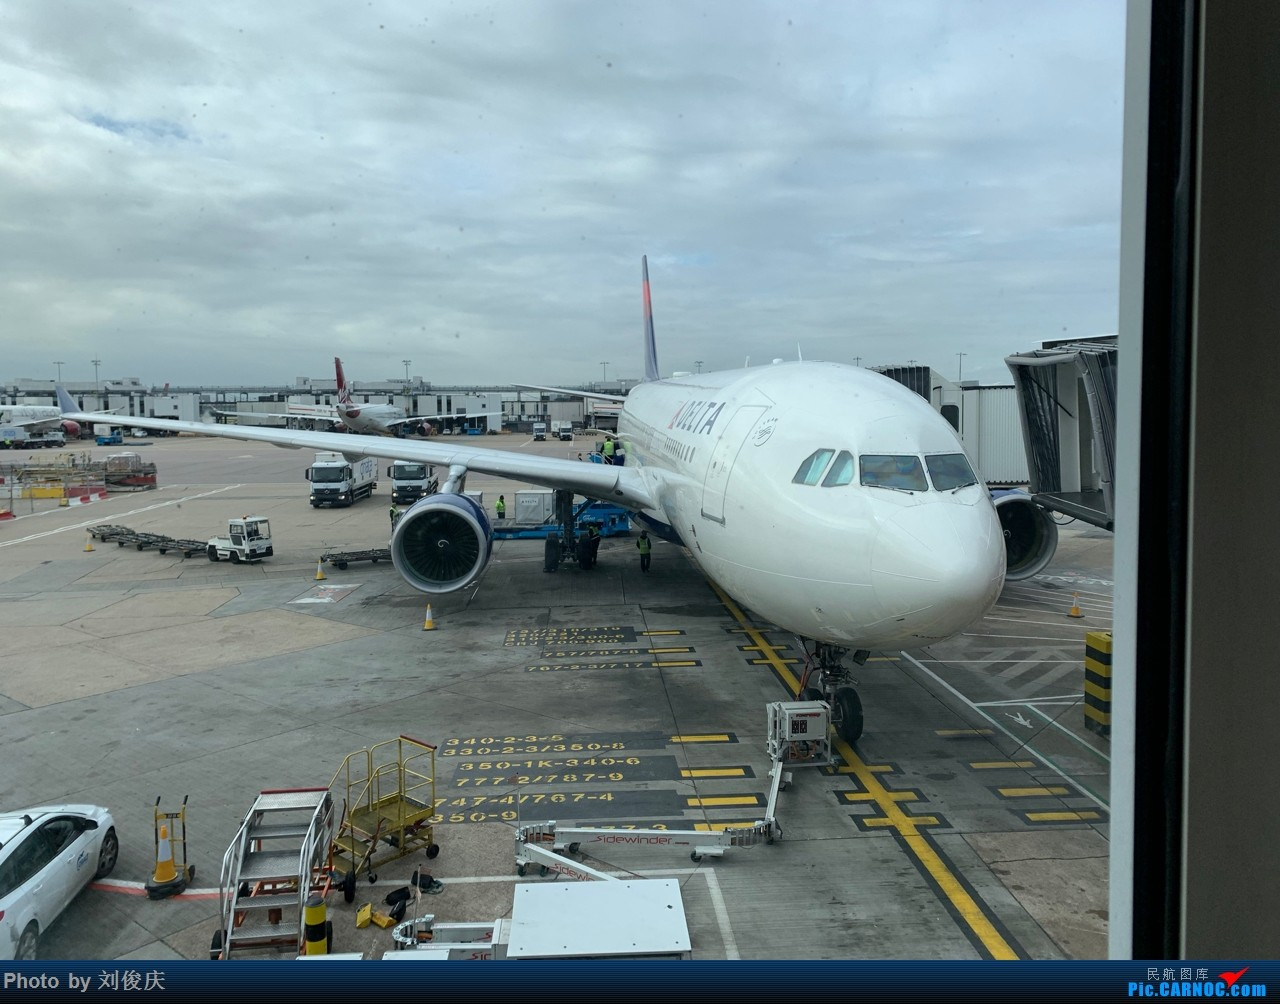 Re:[原创]SEA-JFK-LHR-CDG-FCO-CDG-LHR-ATL-SEA 8天3国5城暴走游记 [更新至JFK] AIRBUS 330-200  LHR T3